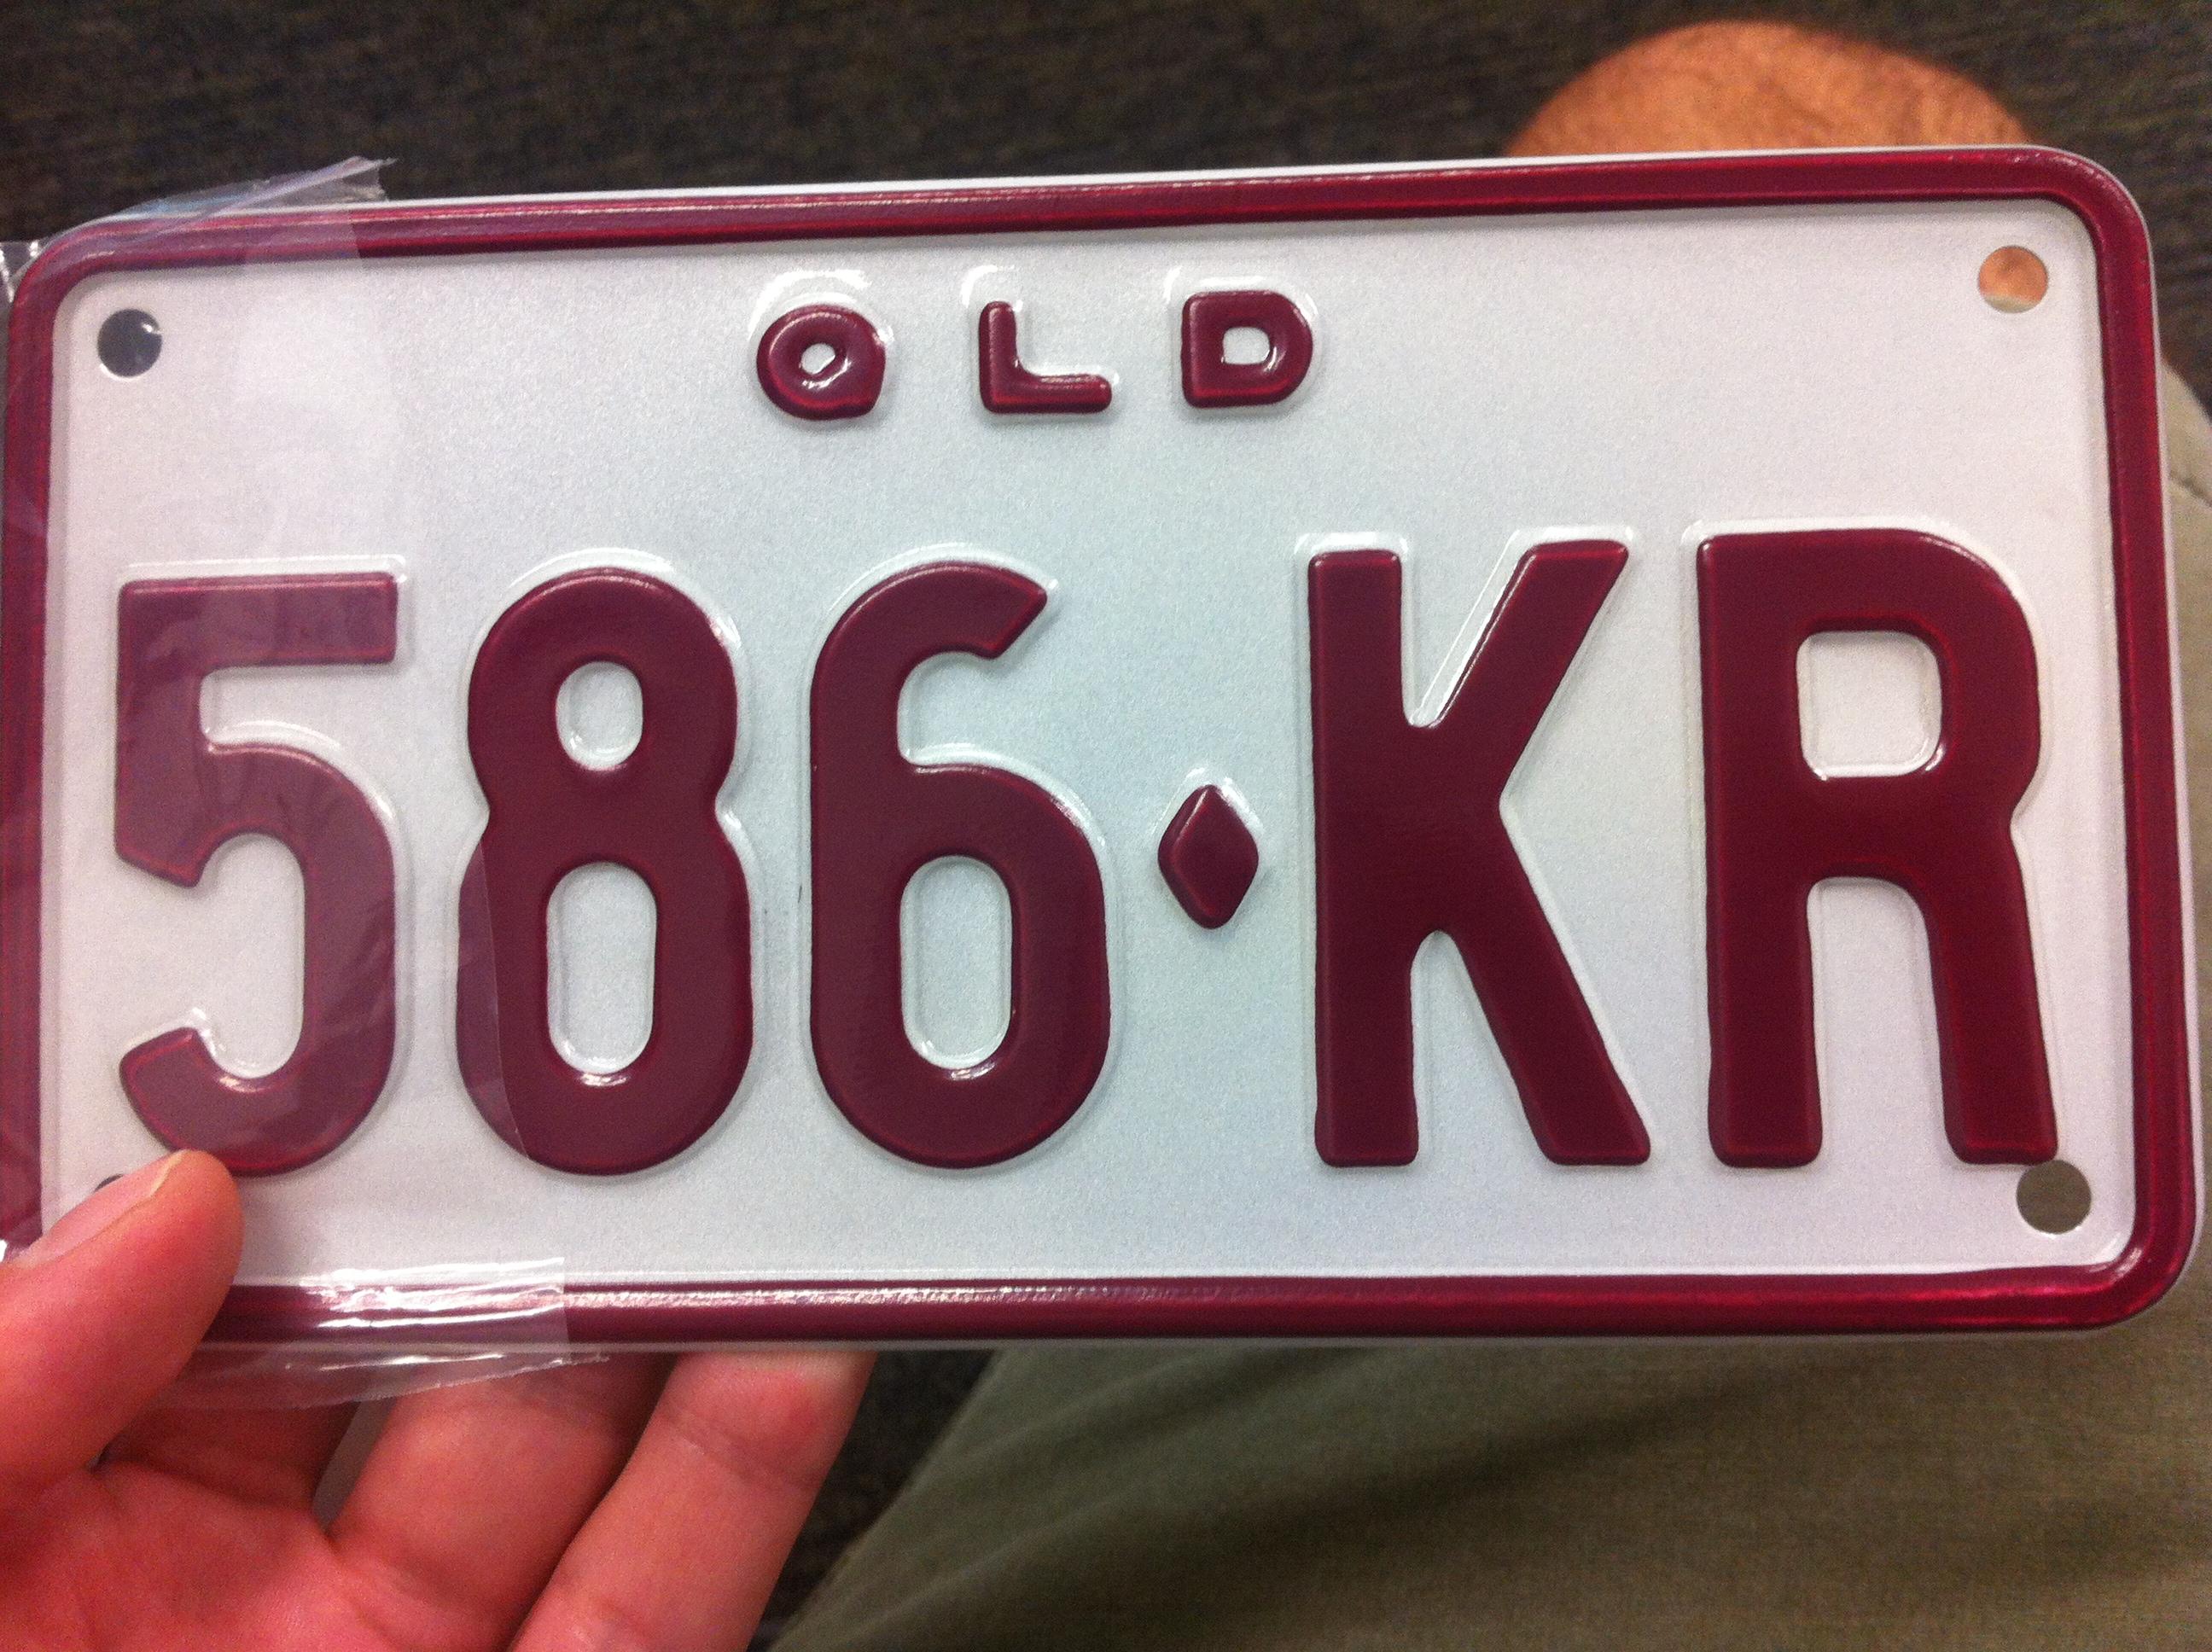 Comprar un veiculo en Australia